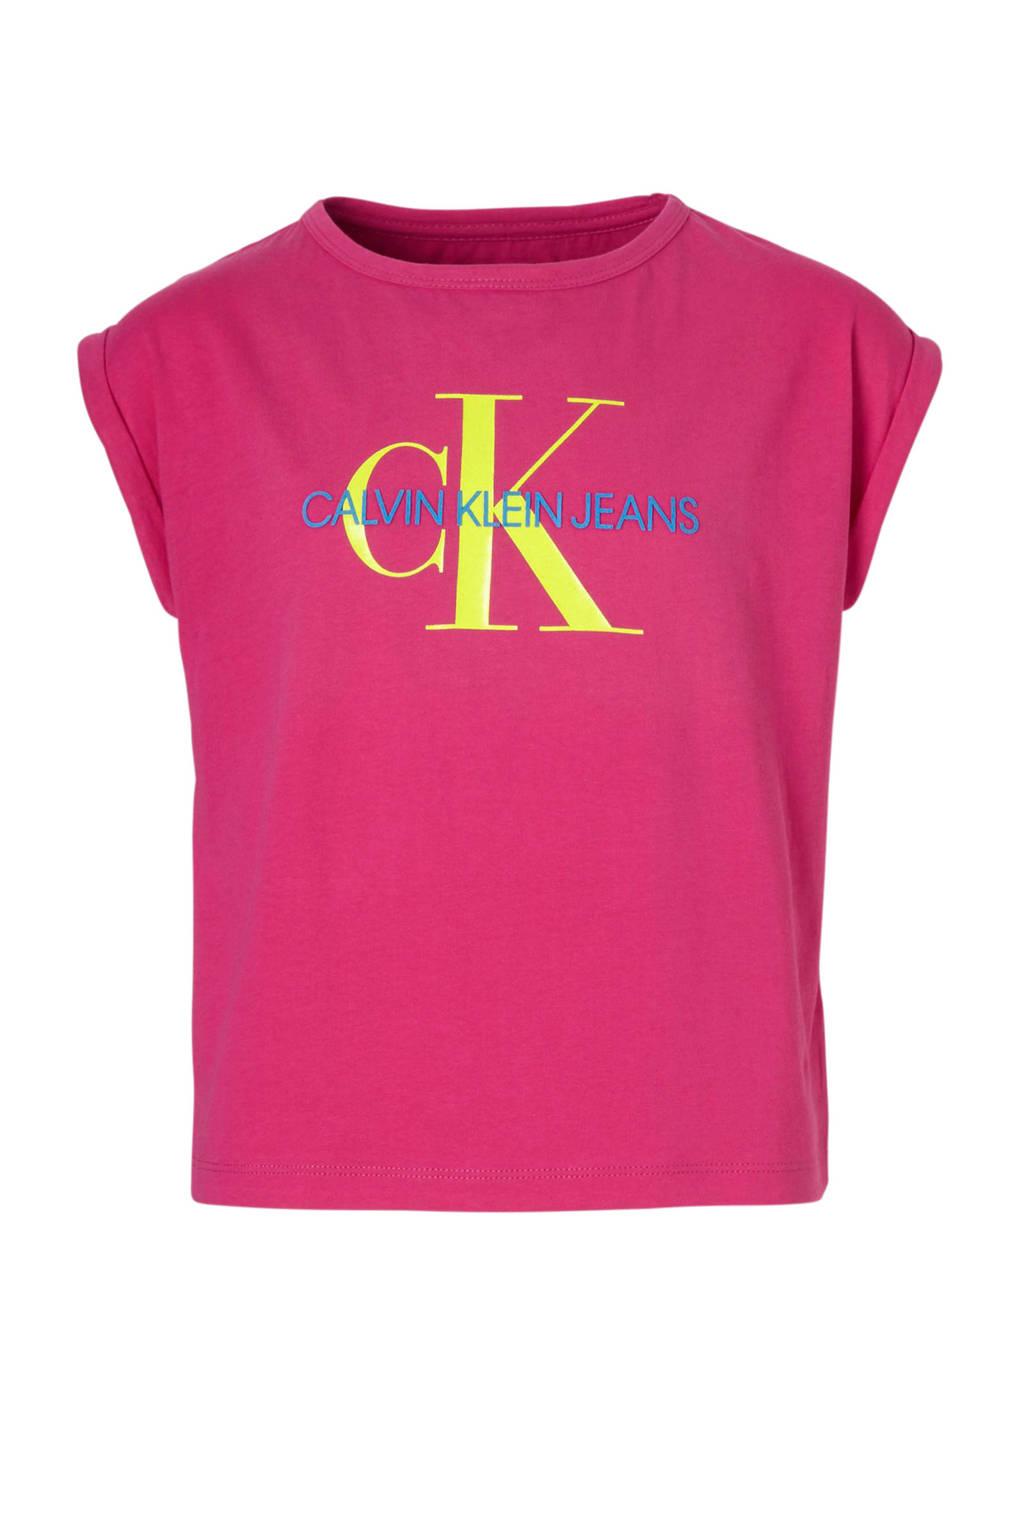 Calvin Klein Jeans T-shirt met logo fuchsia, Fuchsia